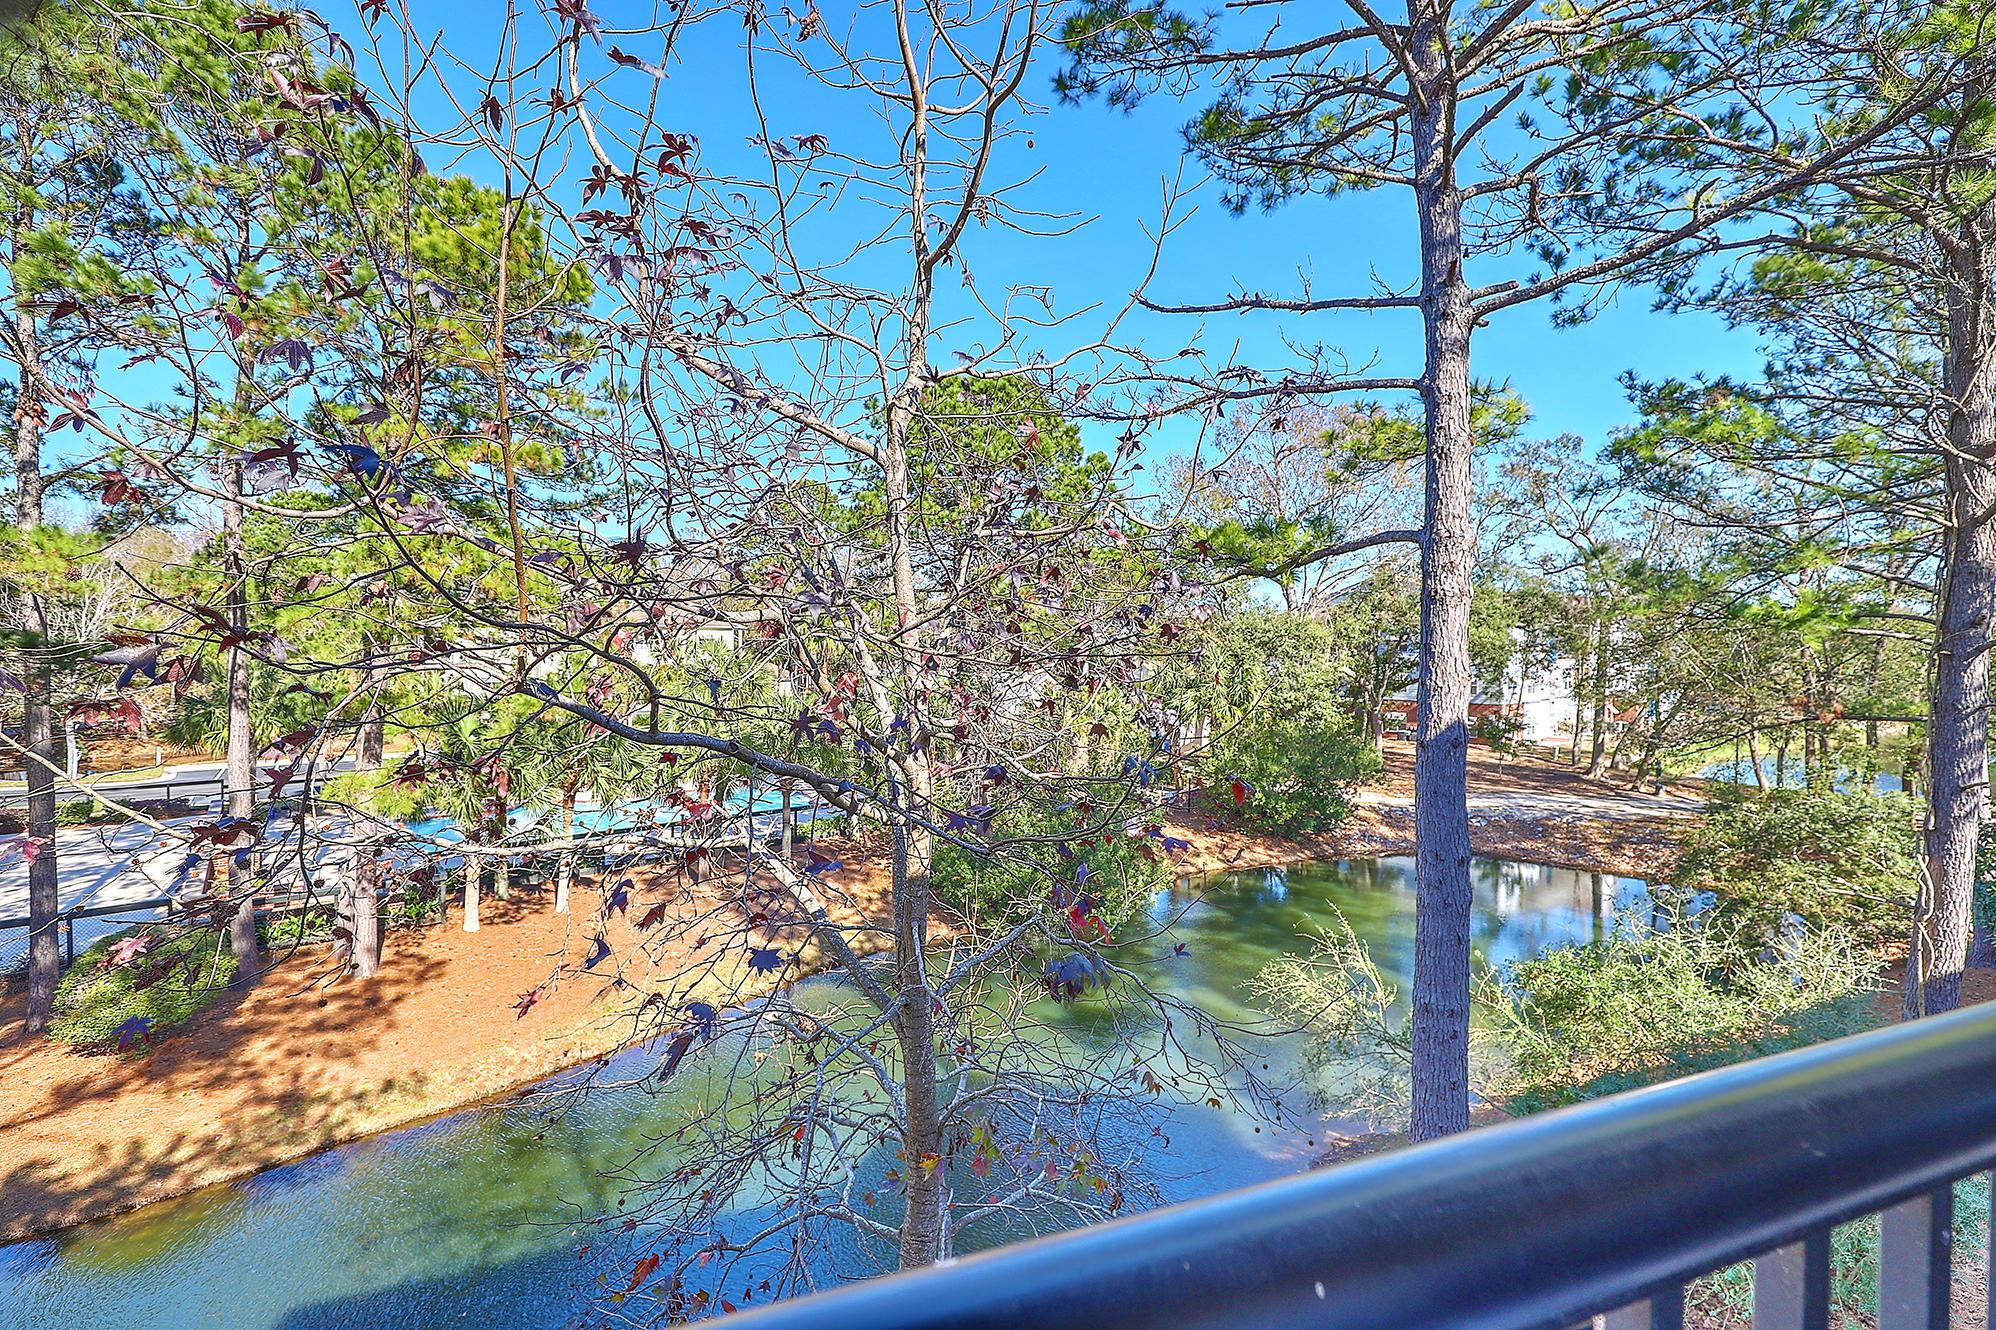 1025 #922 Riverland Woods Place Charleston, SC 29412